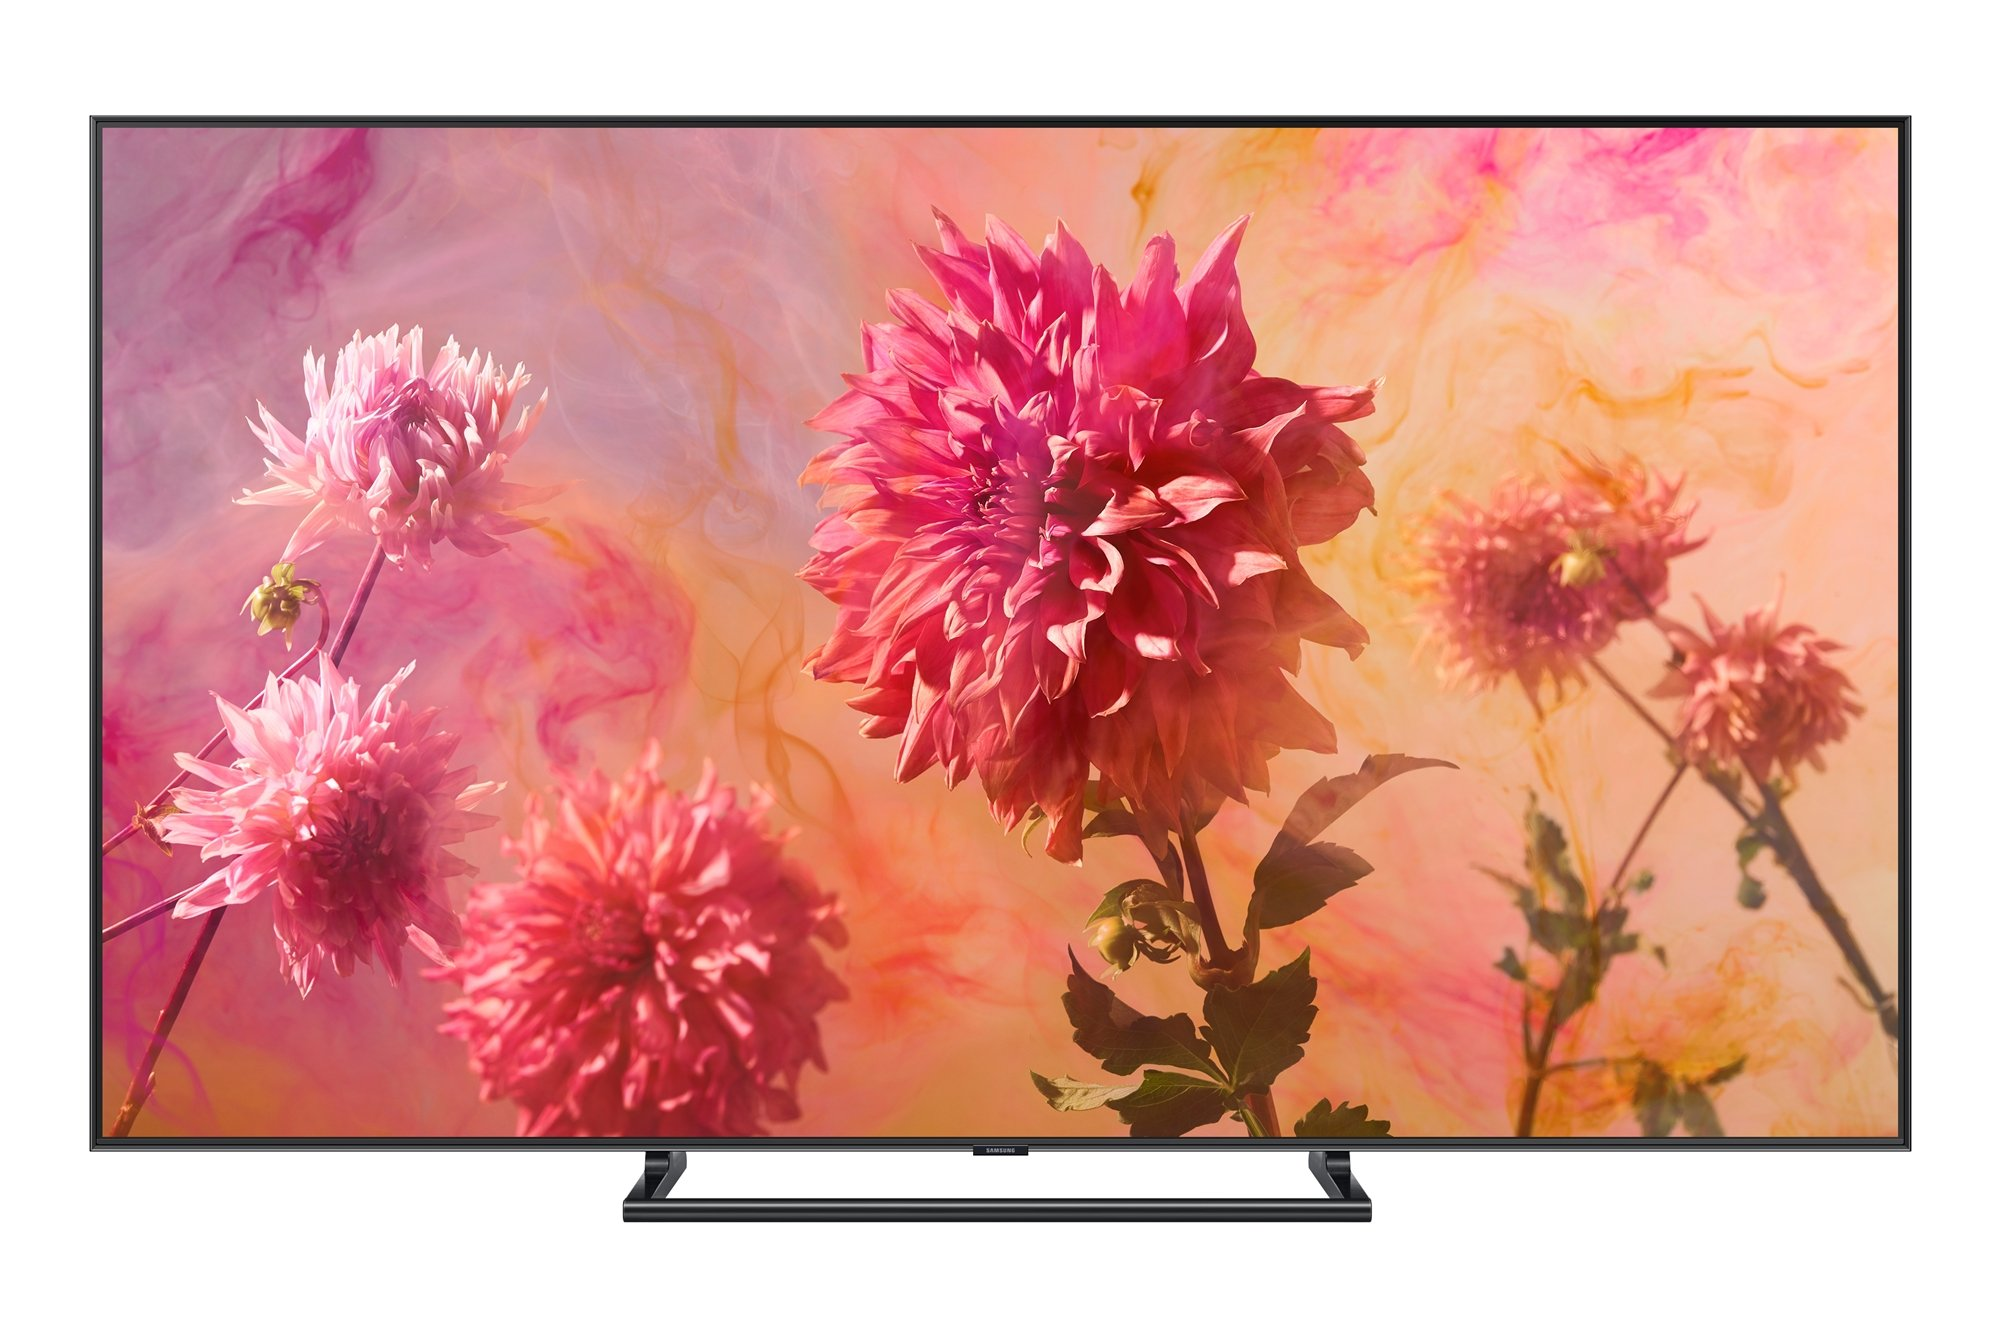 2018 QLED TV Samsung